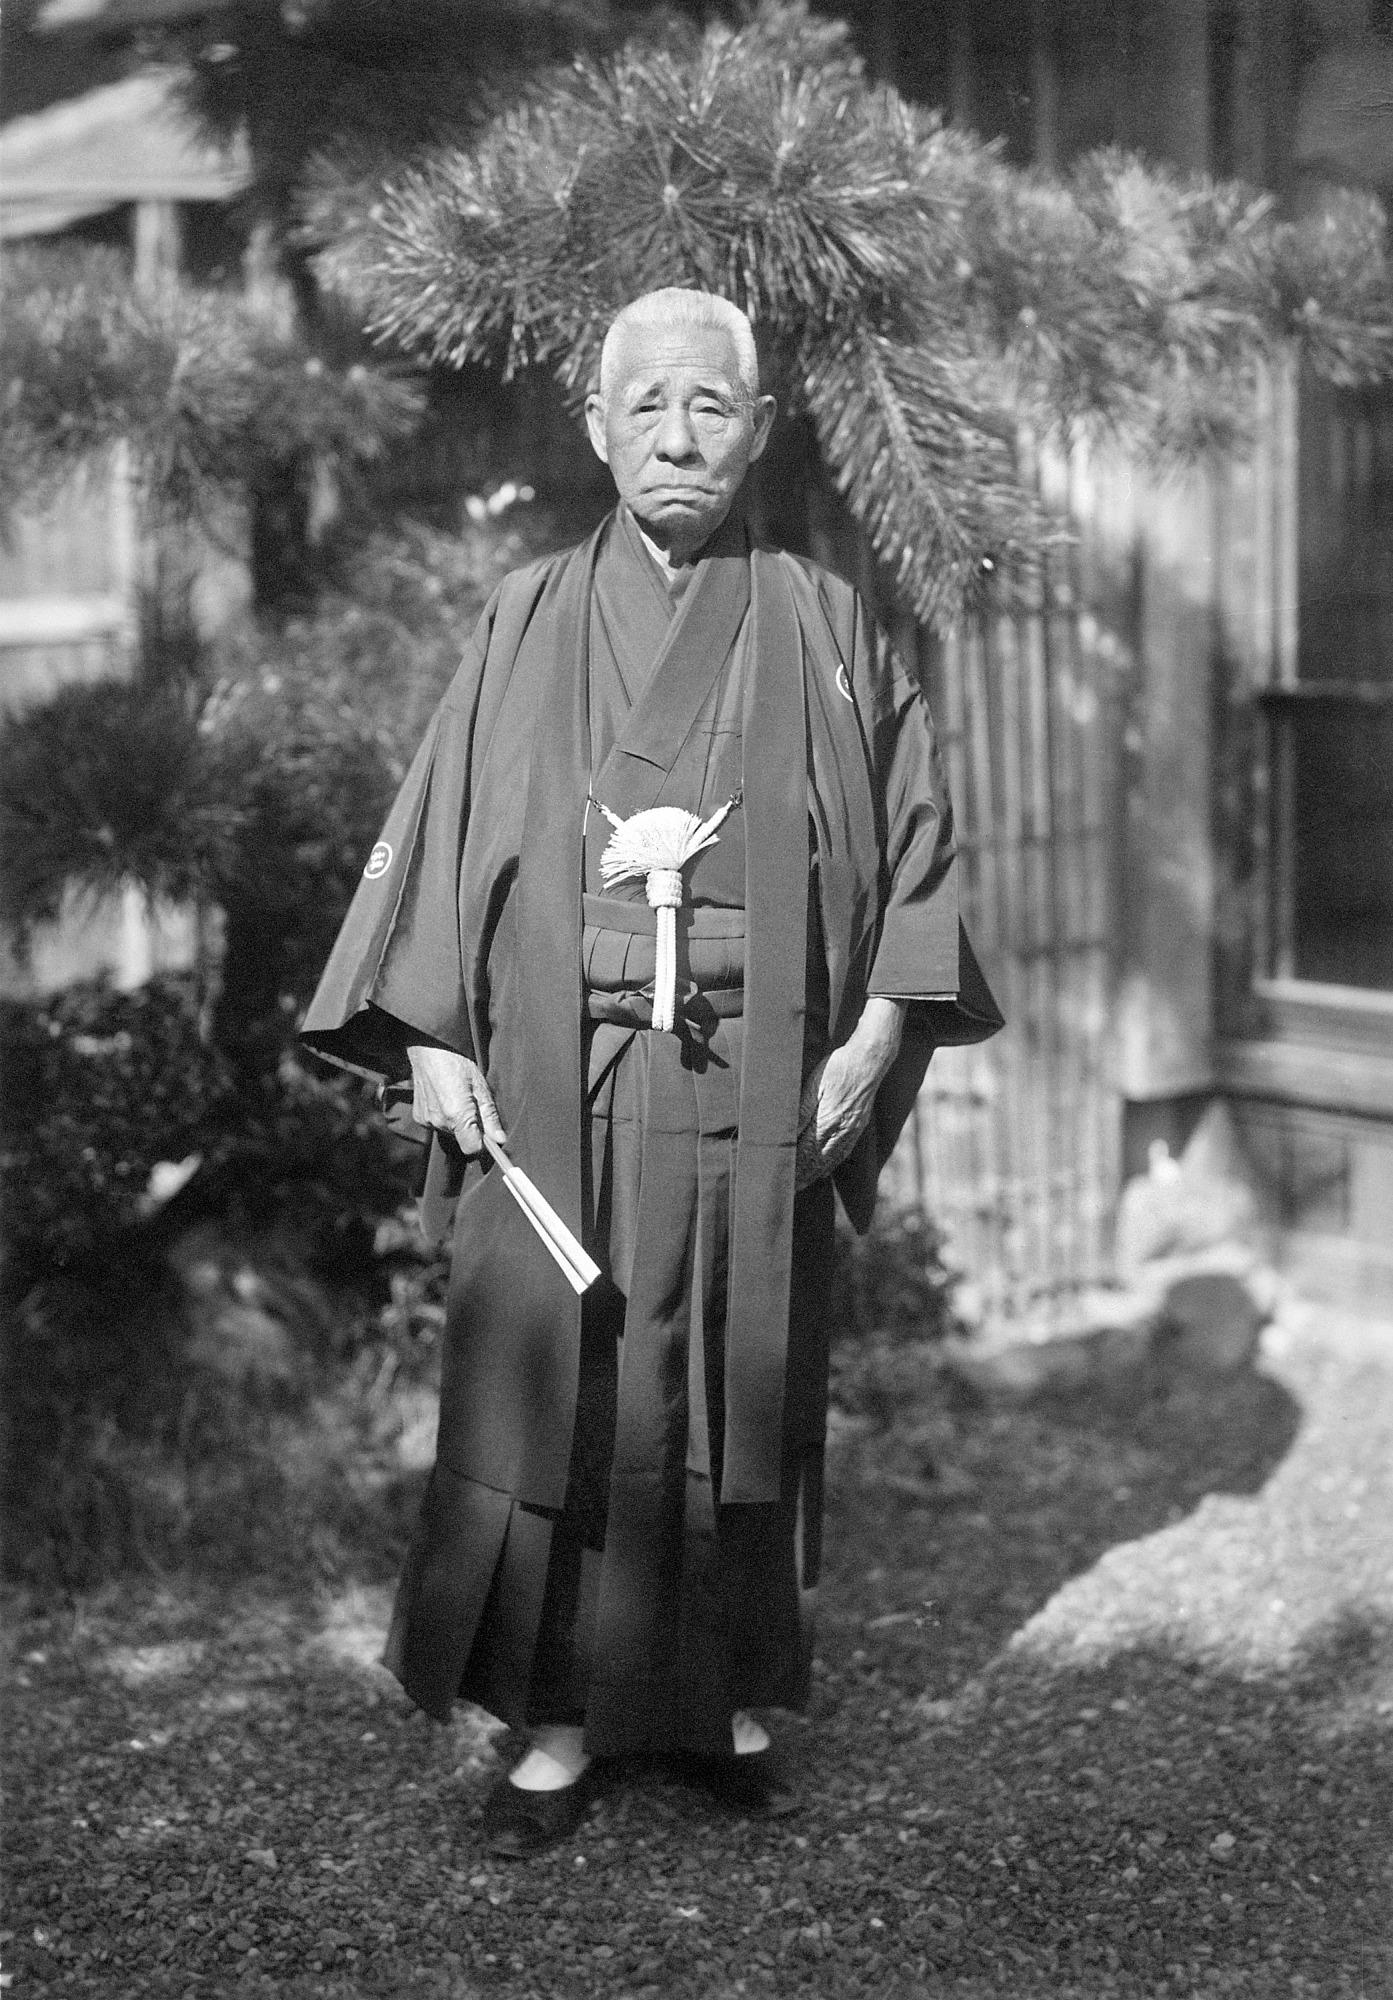 Kokichi Mikimoto, by Henderson, Edward Porter, 1945, Smithsonian Archives - History Div, 85-11399.